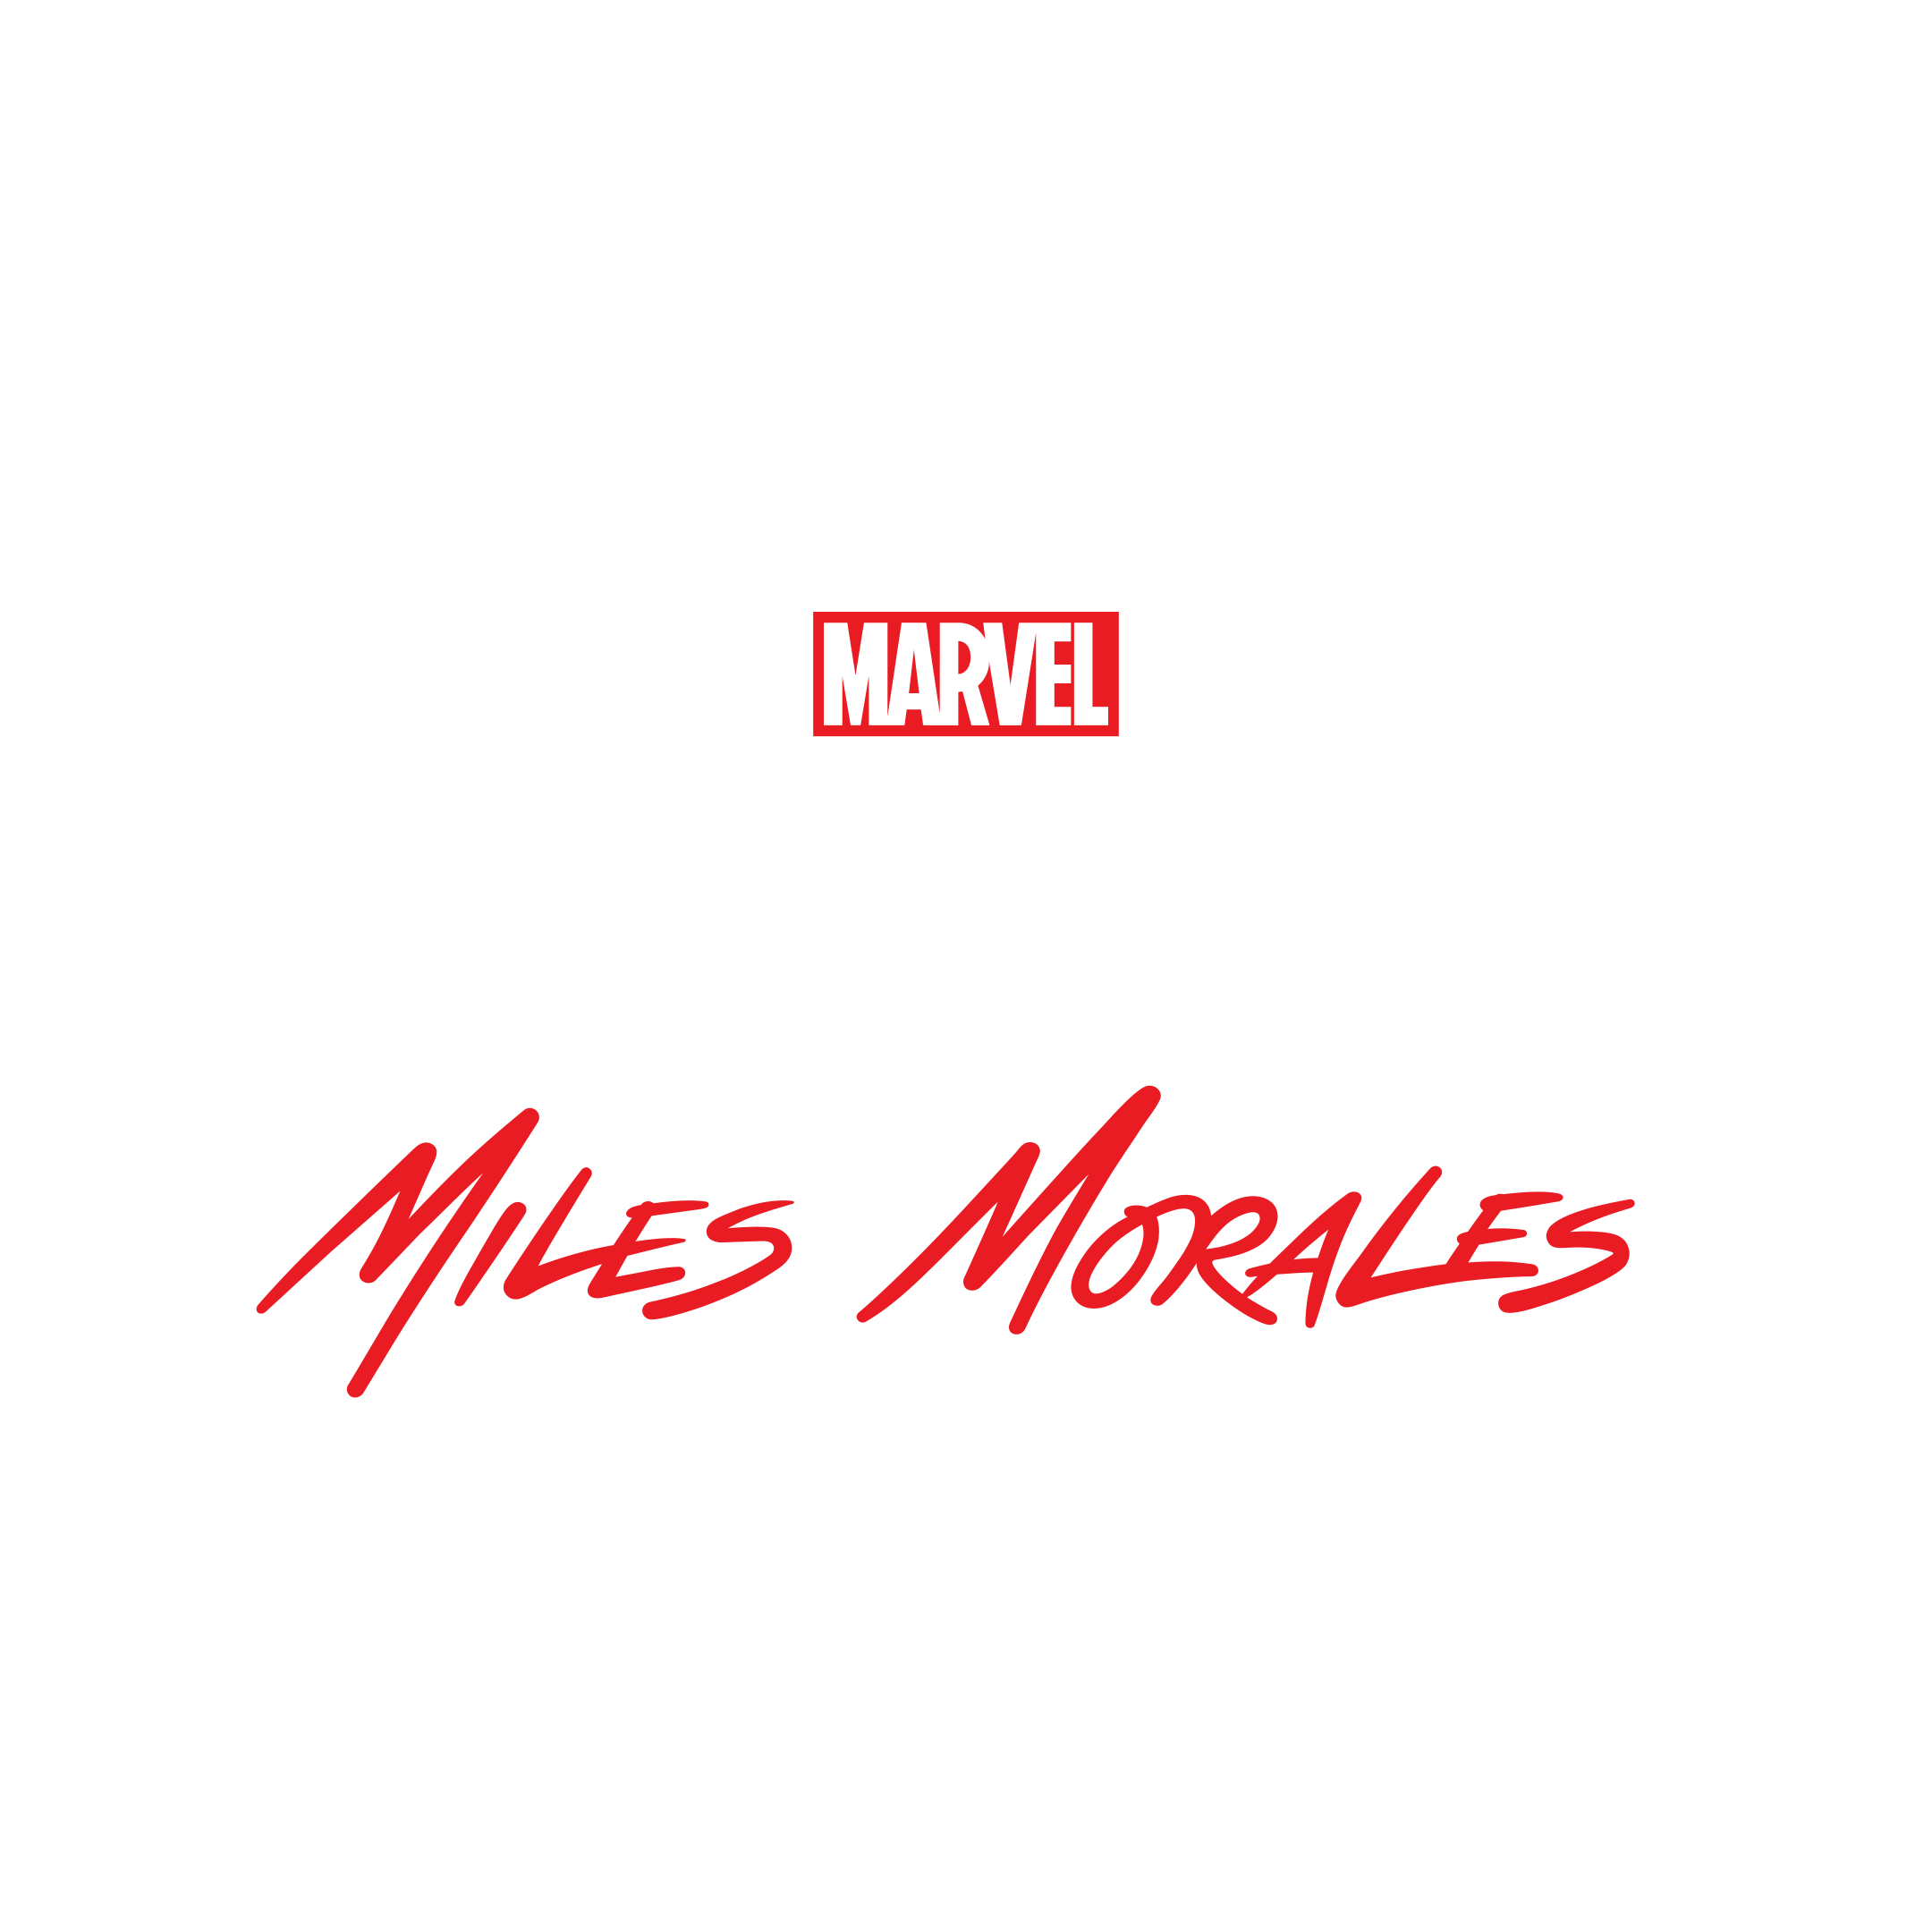 [HERO] Spider-Man: Miles Morales - Logo